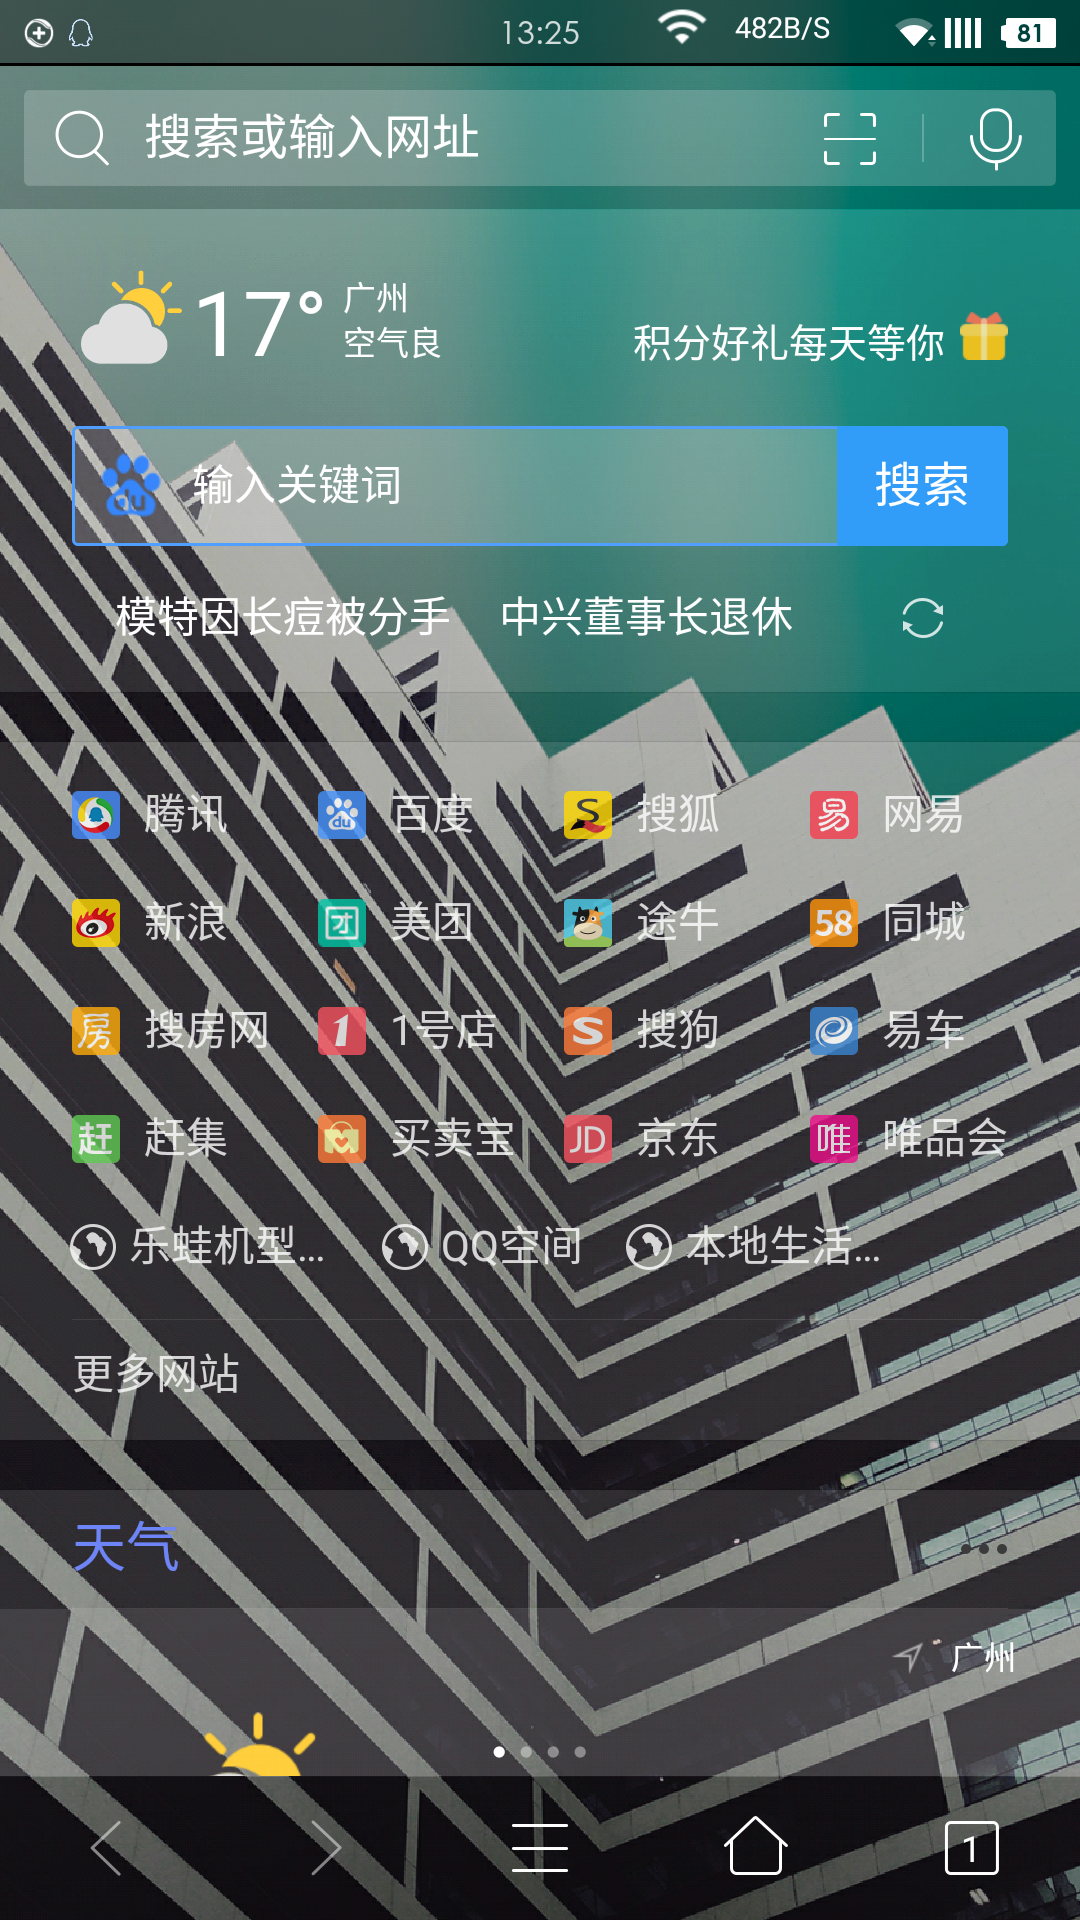 Screenshot_2016-01-09-13-25-10.png